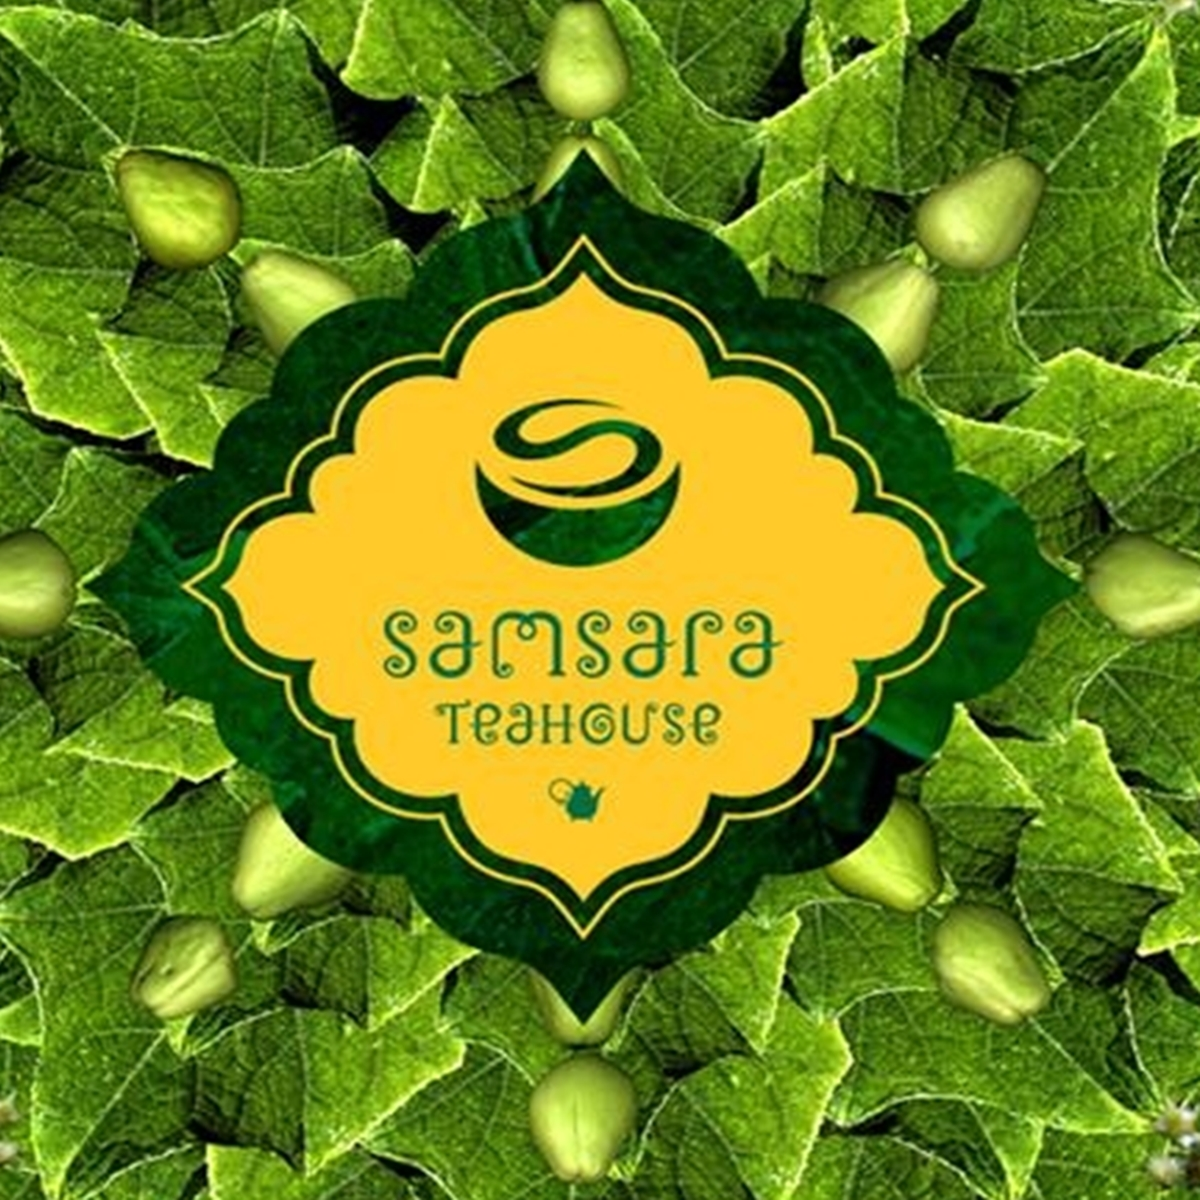 Samsara Chillout Teahouse